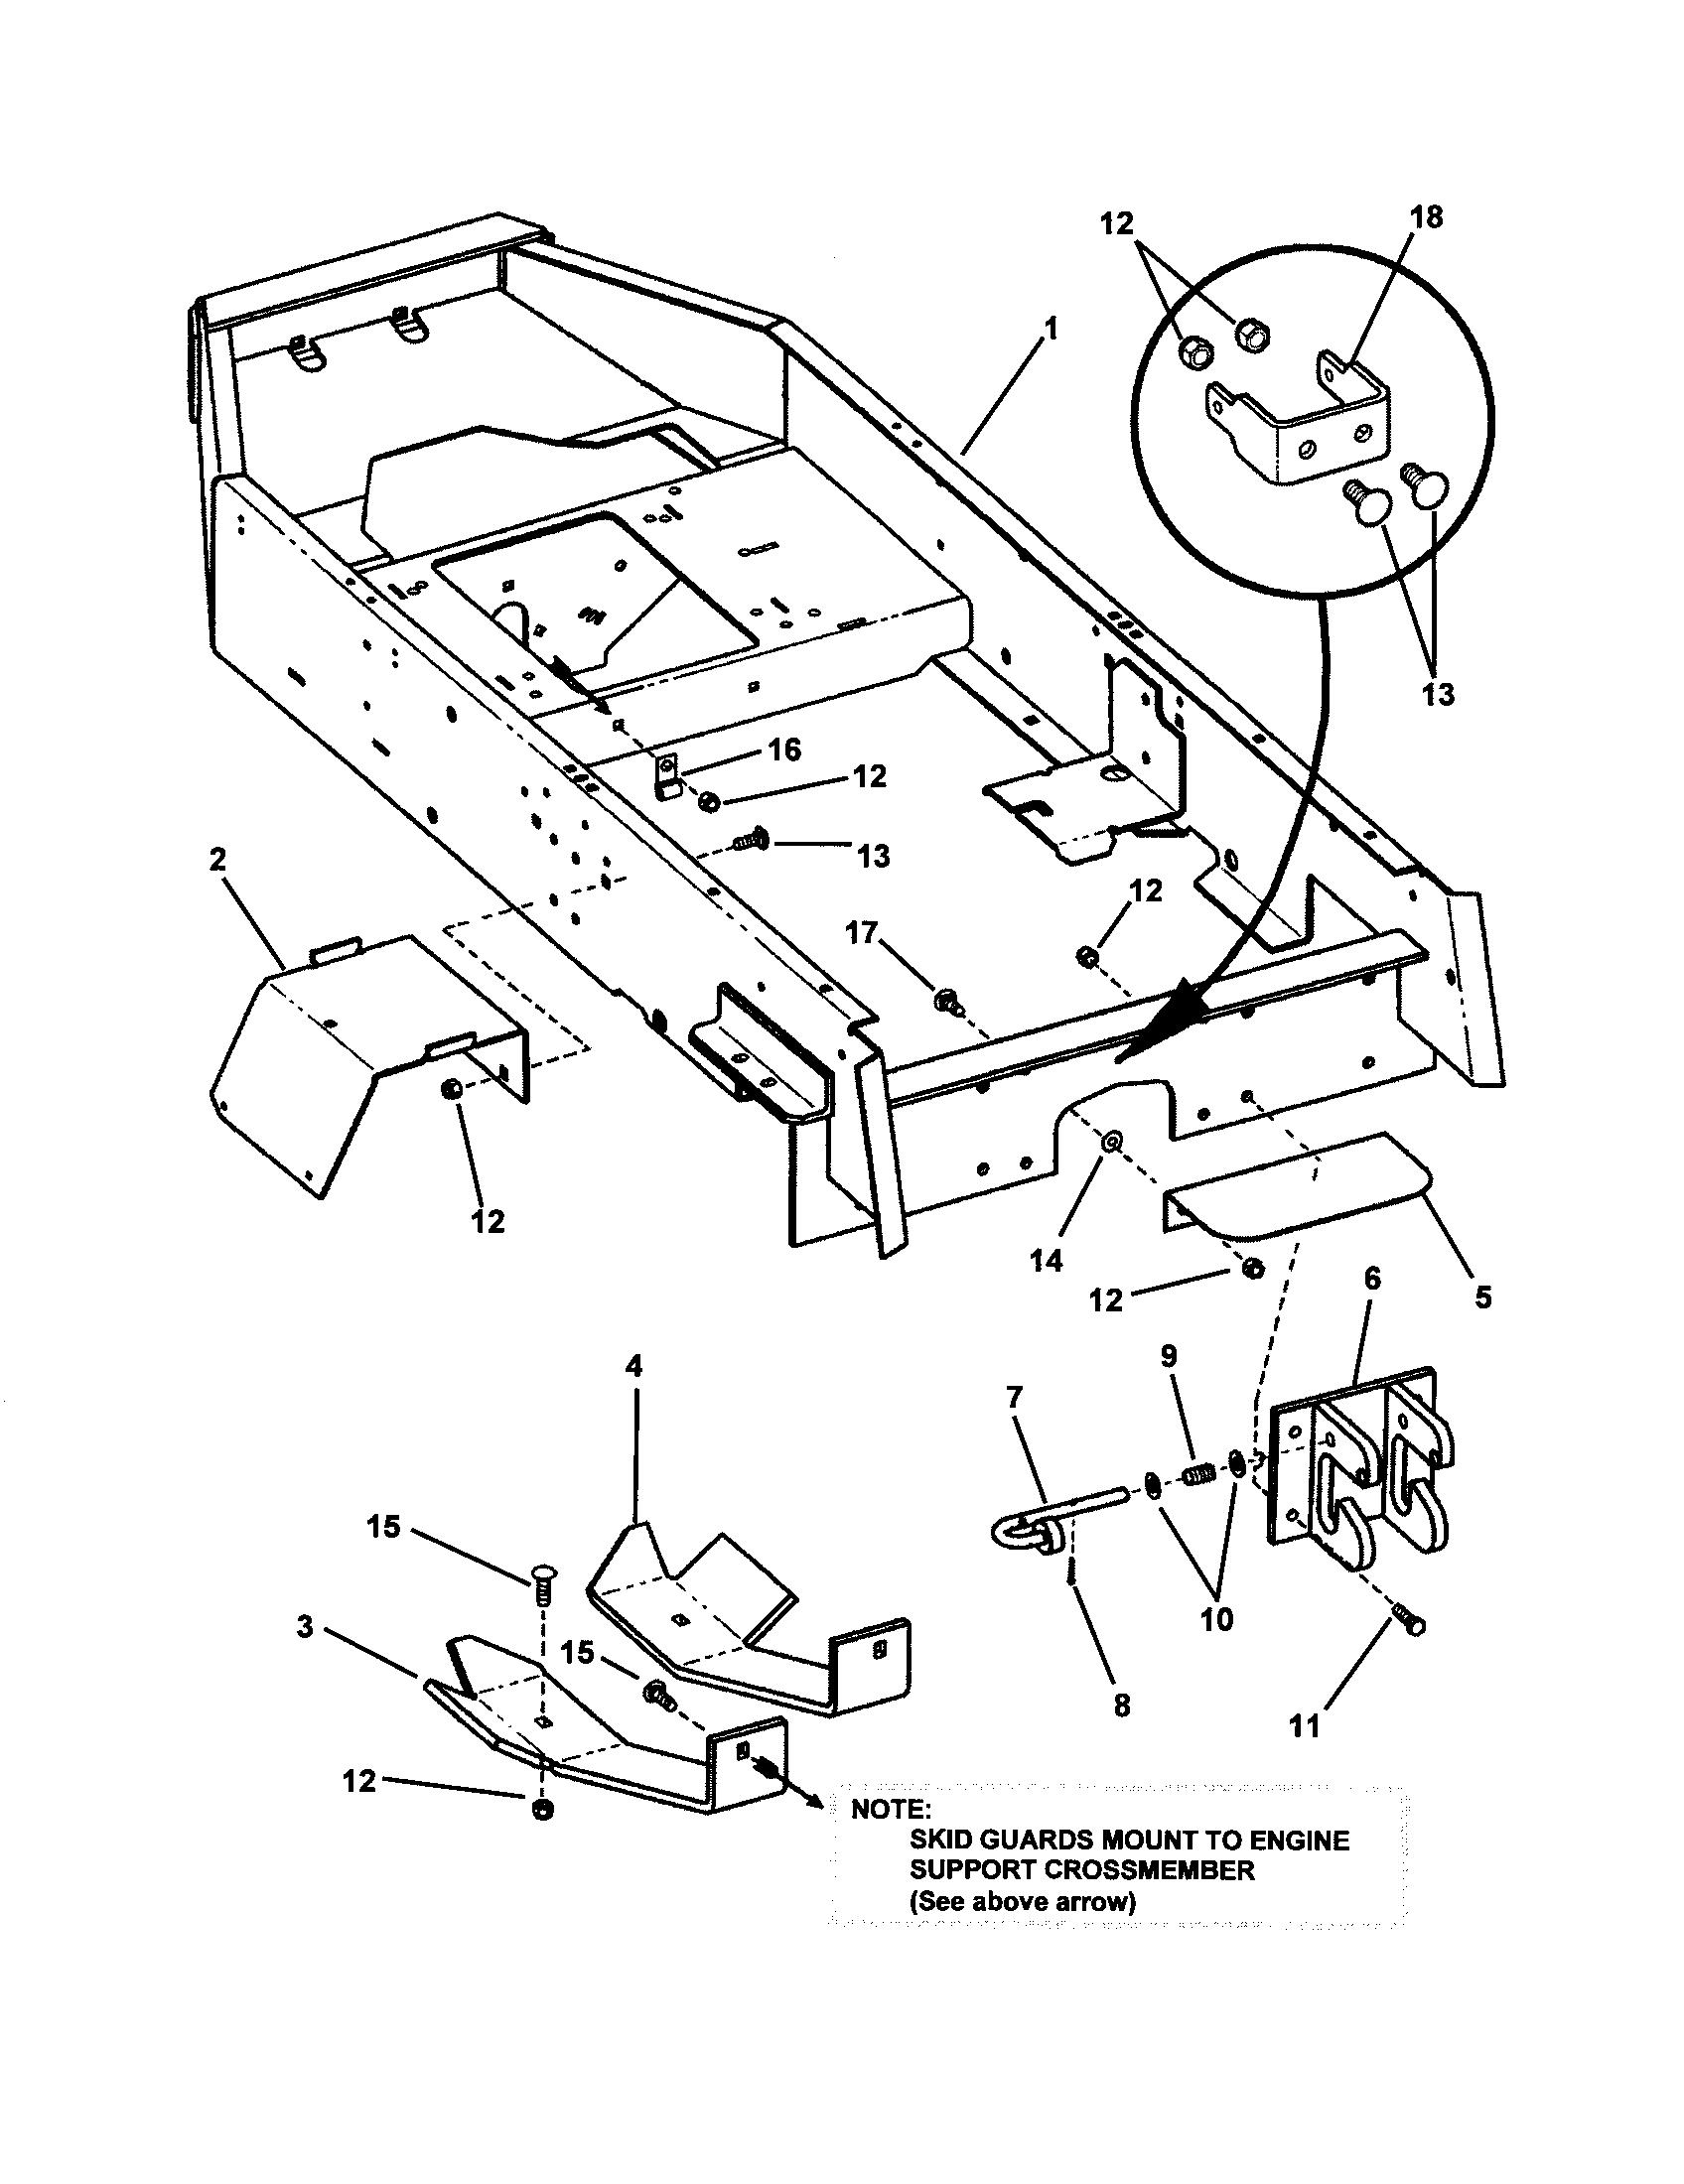 Kubota D722 Engine Wiring Diagram, Kubota, Free Engine